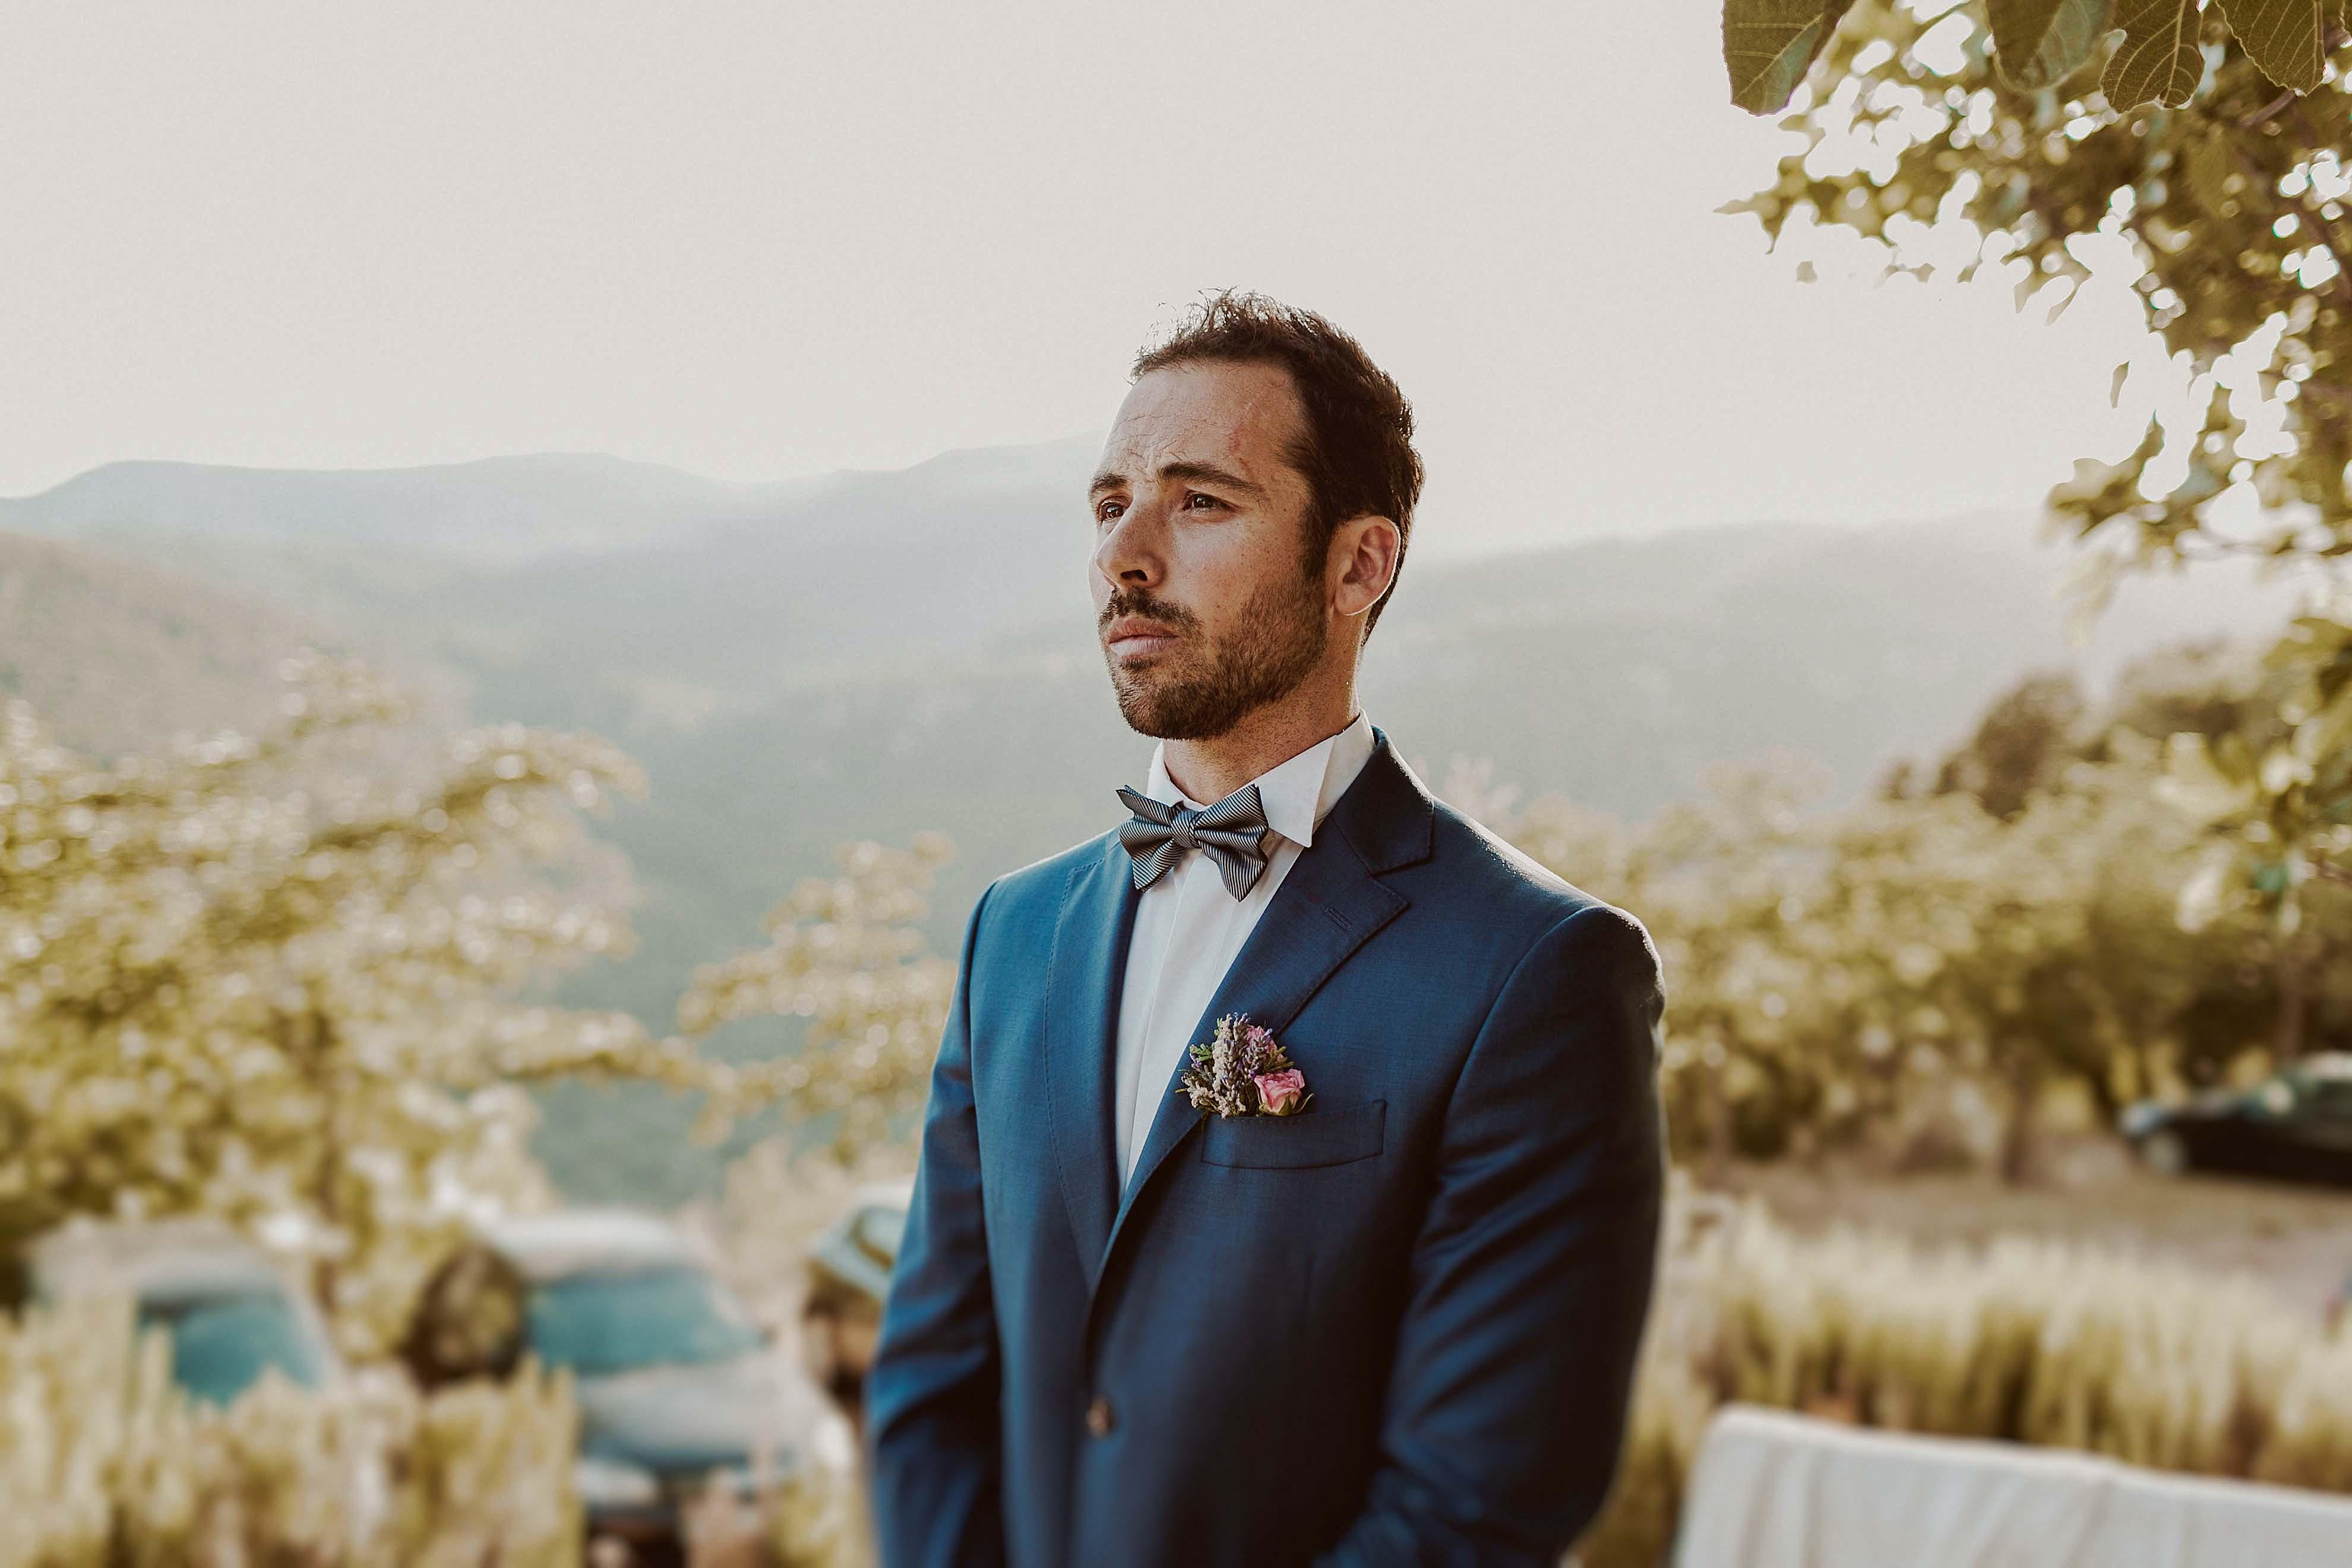 Boda rústica en la montaña. fotgrafo de bodas barcelona_050